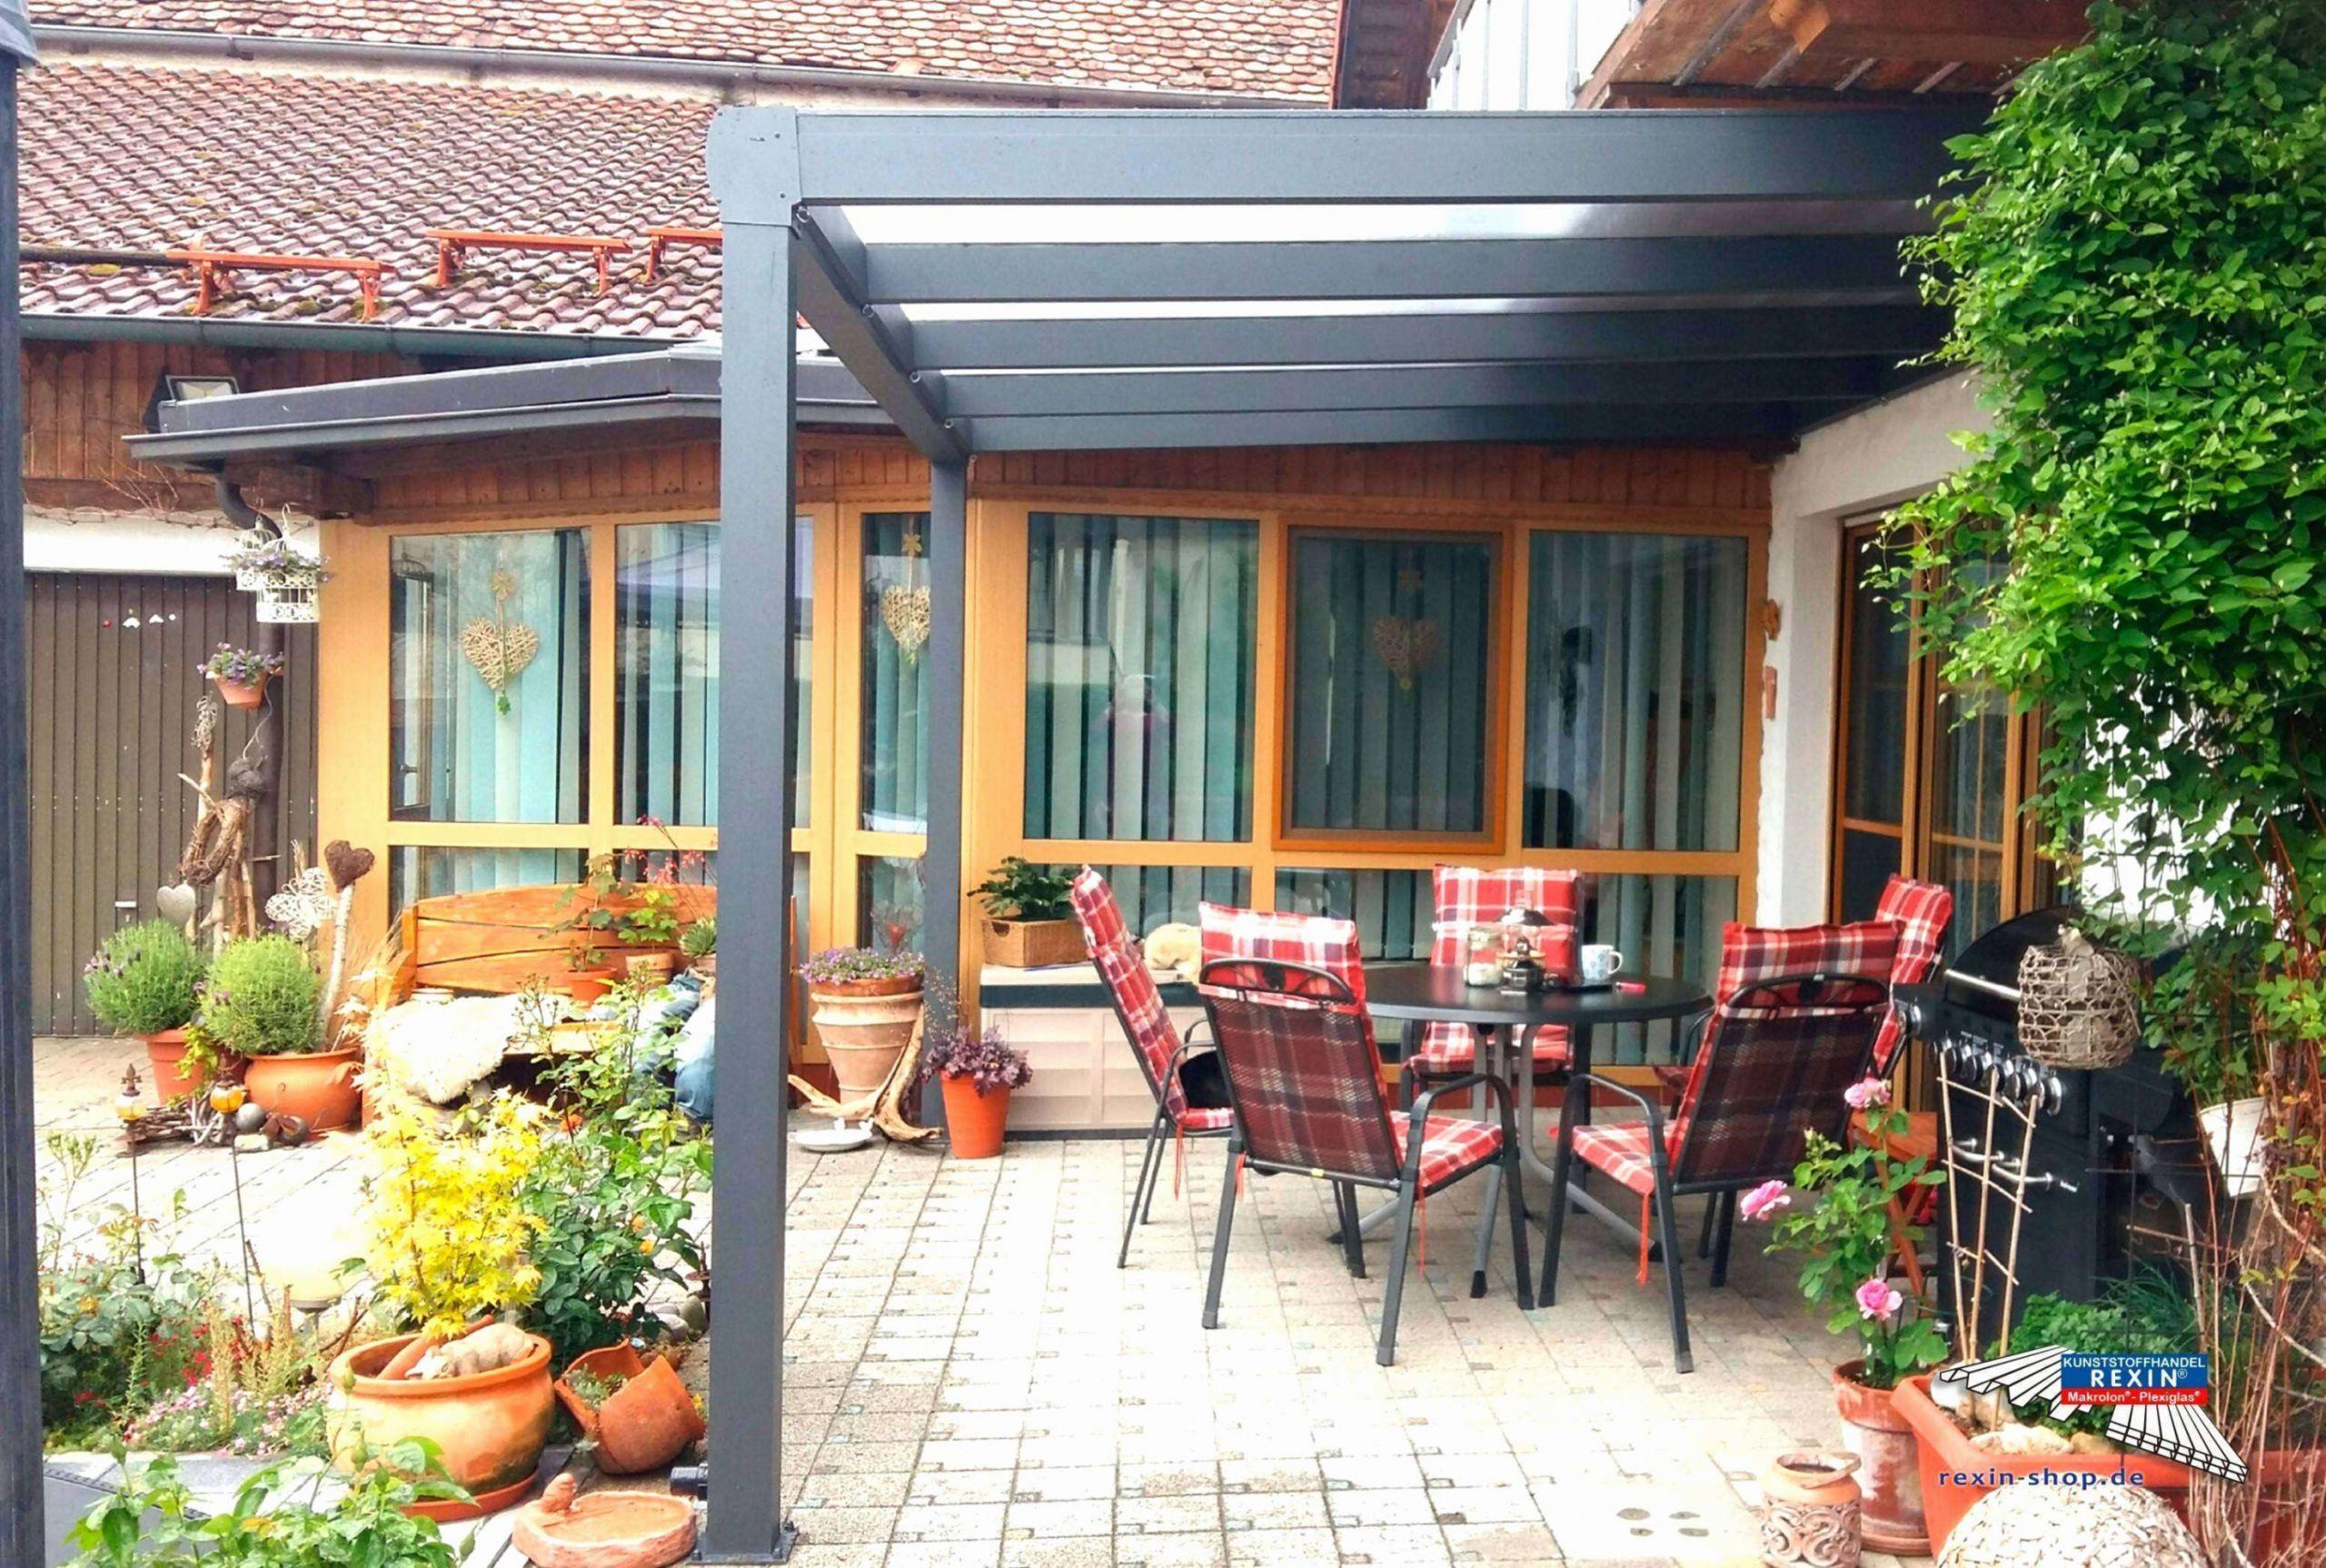 Deko Ideen Selber Machen Garten Frisch Deko Ideen Selber Machen Garten — Temobardz Home Blog